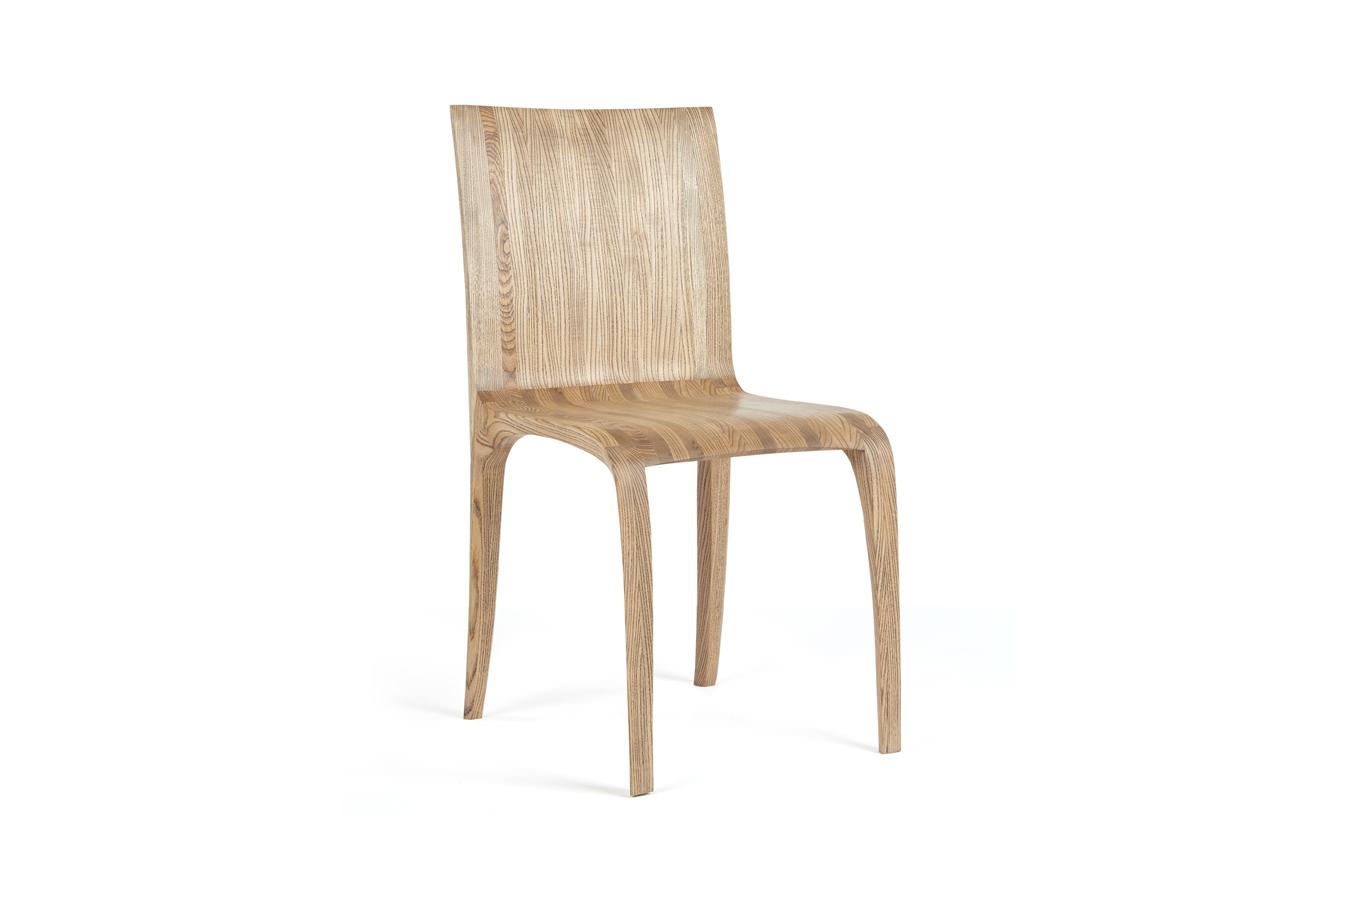 7_Rippled-Ash-Dining-Chair_4.jpg